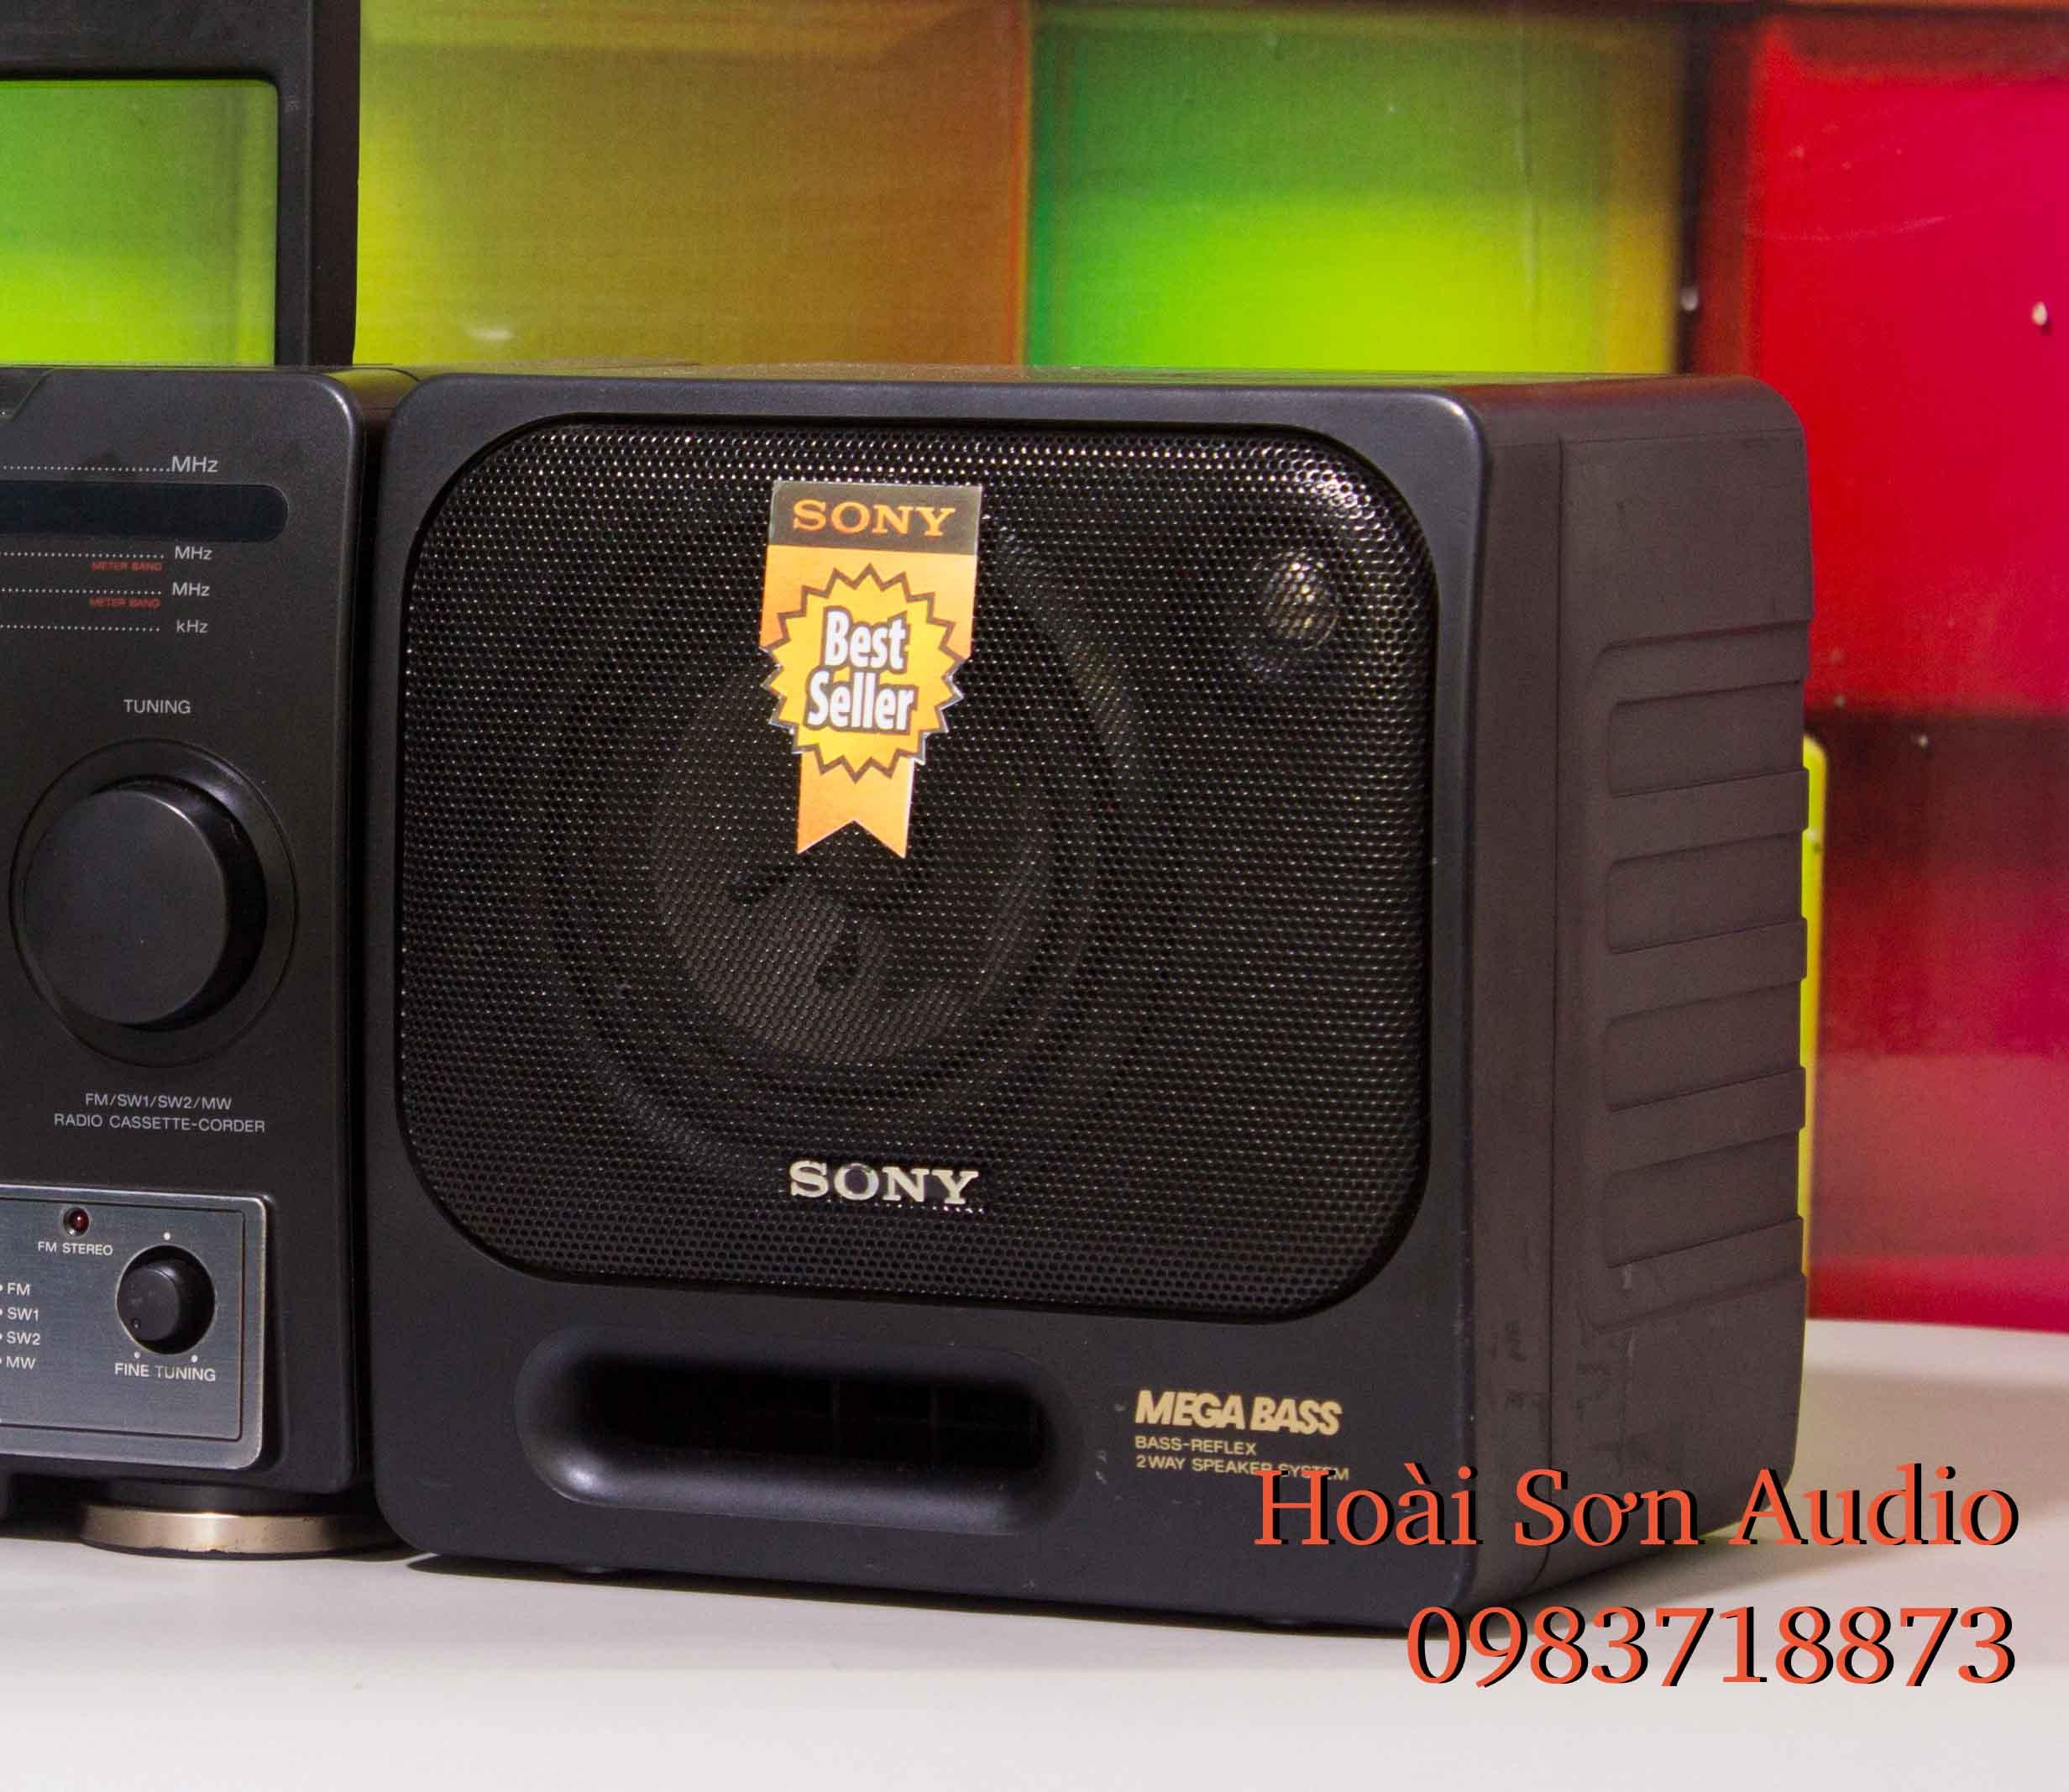 ĐÀI CASSETTE CỔ RADIO SONY 1130S